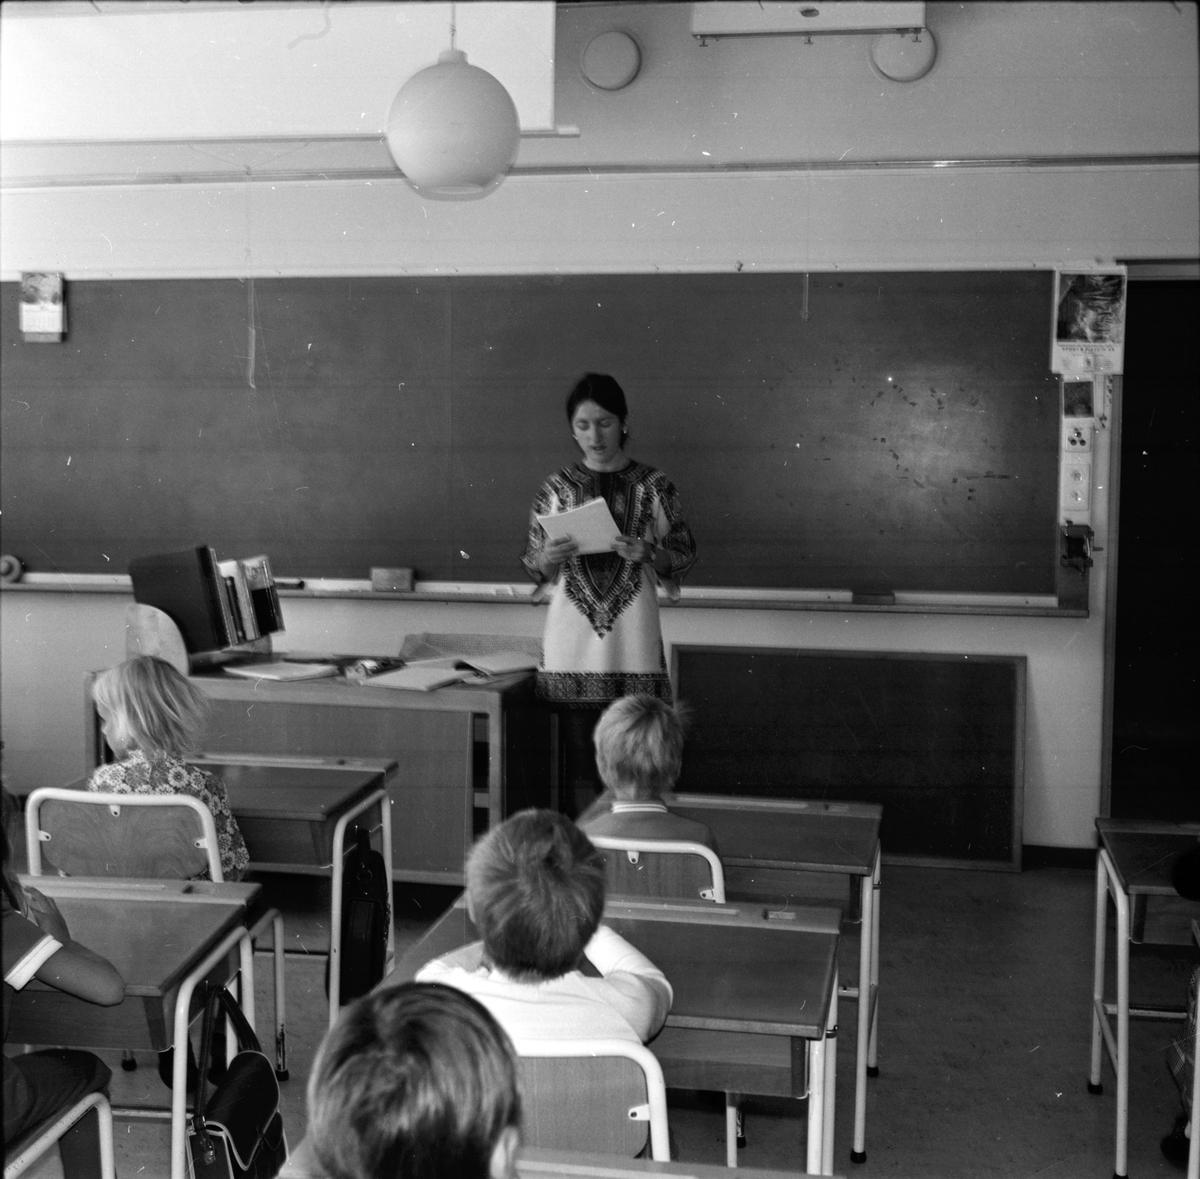 Arbrå, Skolan börjar ht. aug, 1971